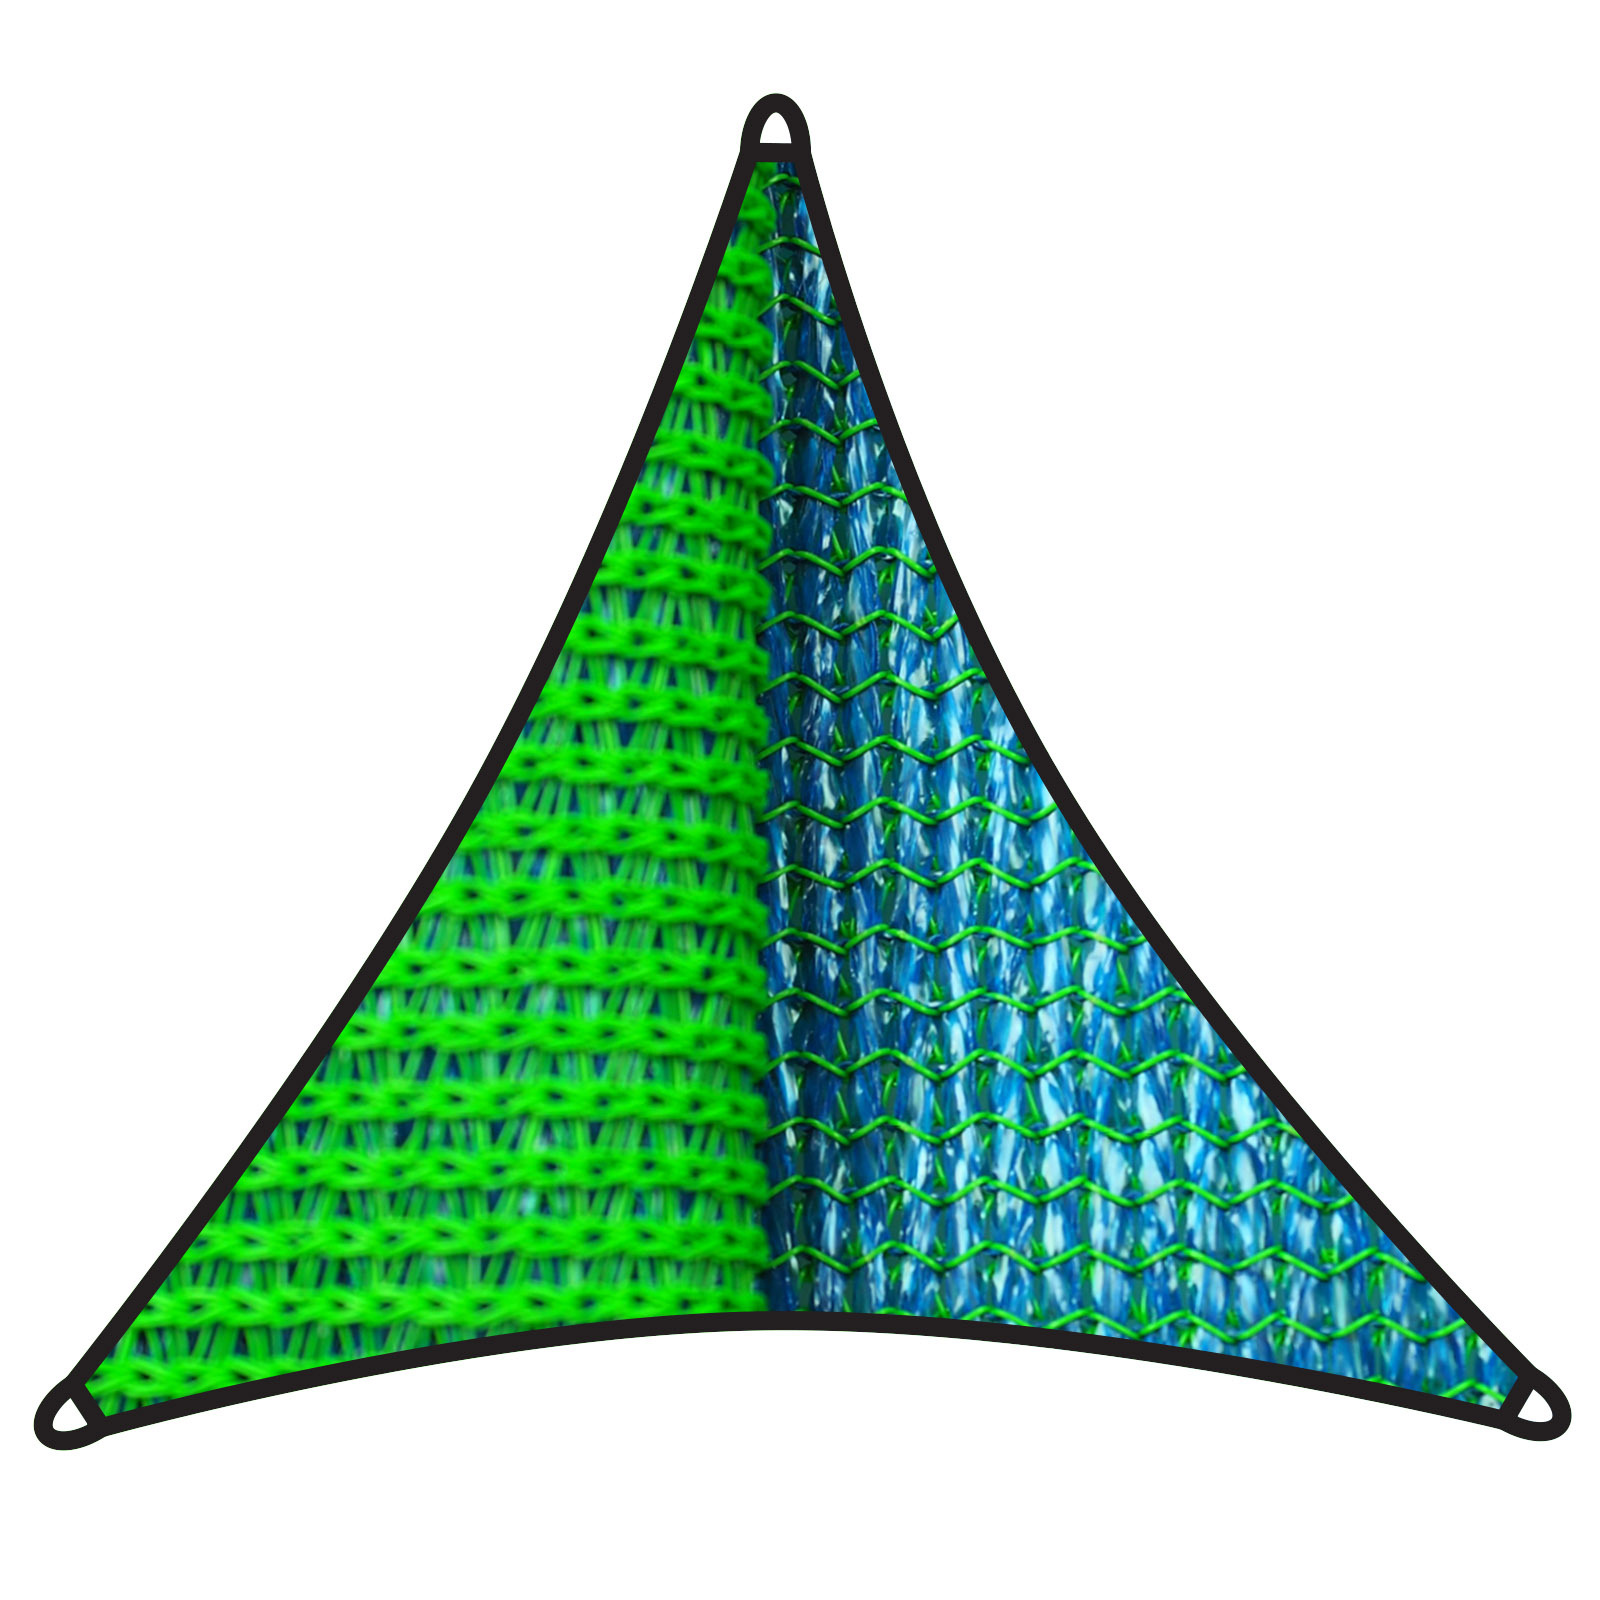 Coolaroo 5m 350gsm Topaz Triangle Dual Shade Sail